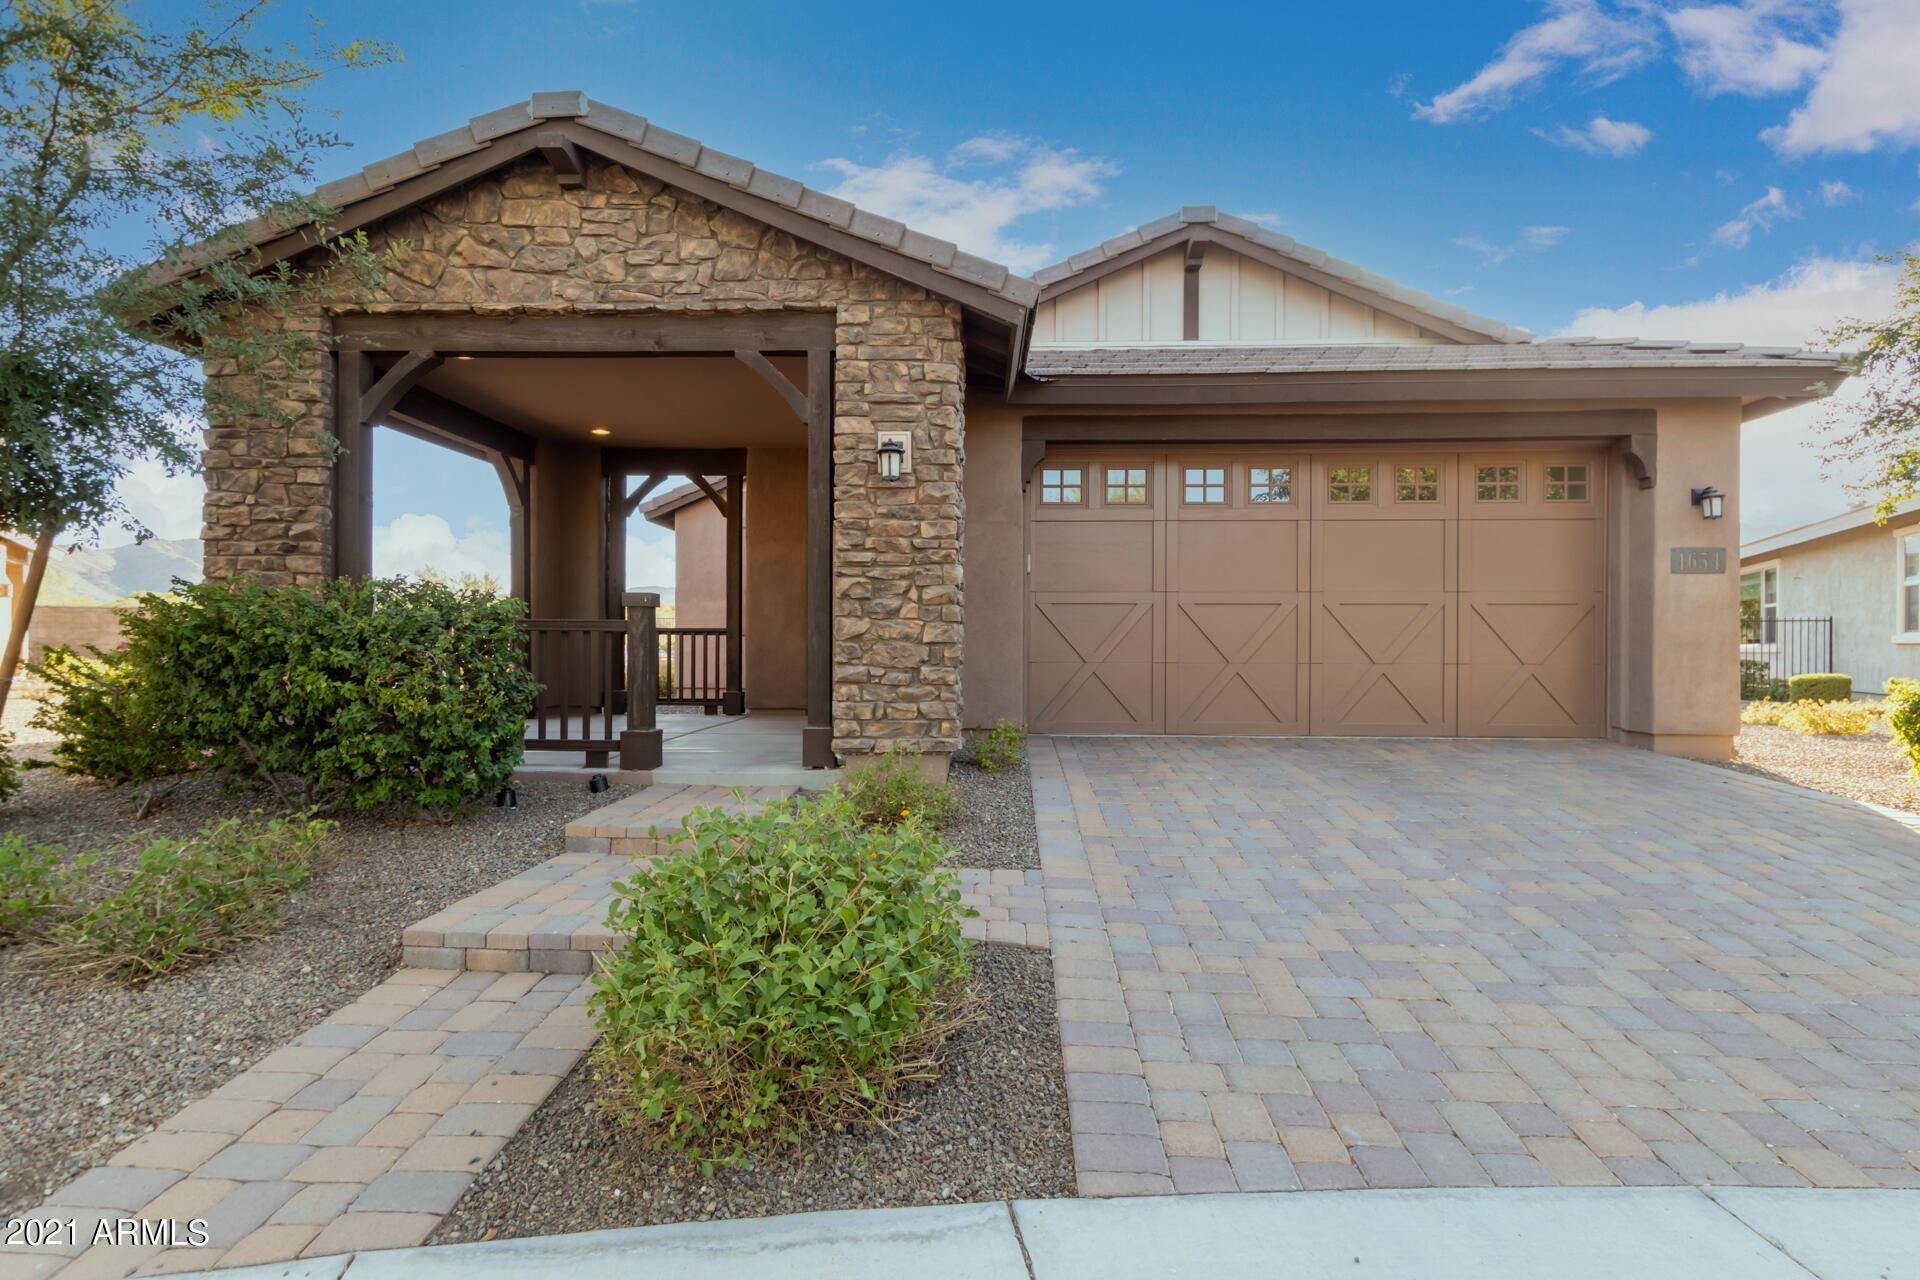 Photo of 4654 N 209th Avenue, Buckeye, AZ 85396 (MLS # 6249397)